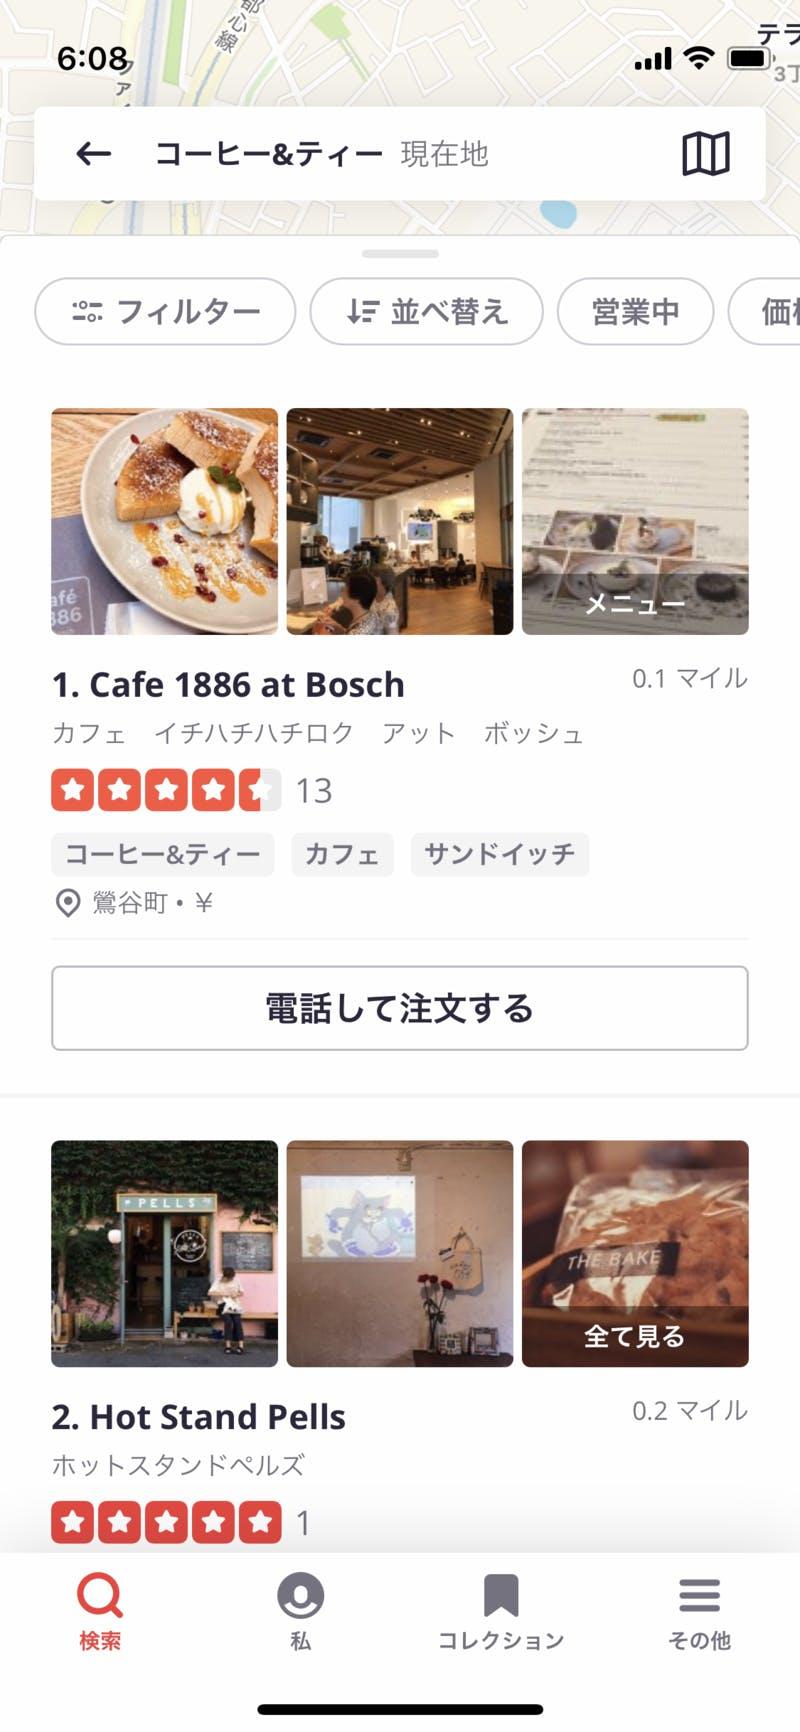 日本語版Yelp